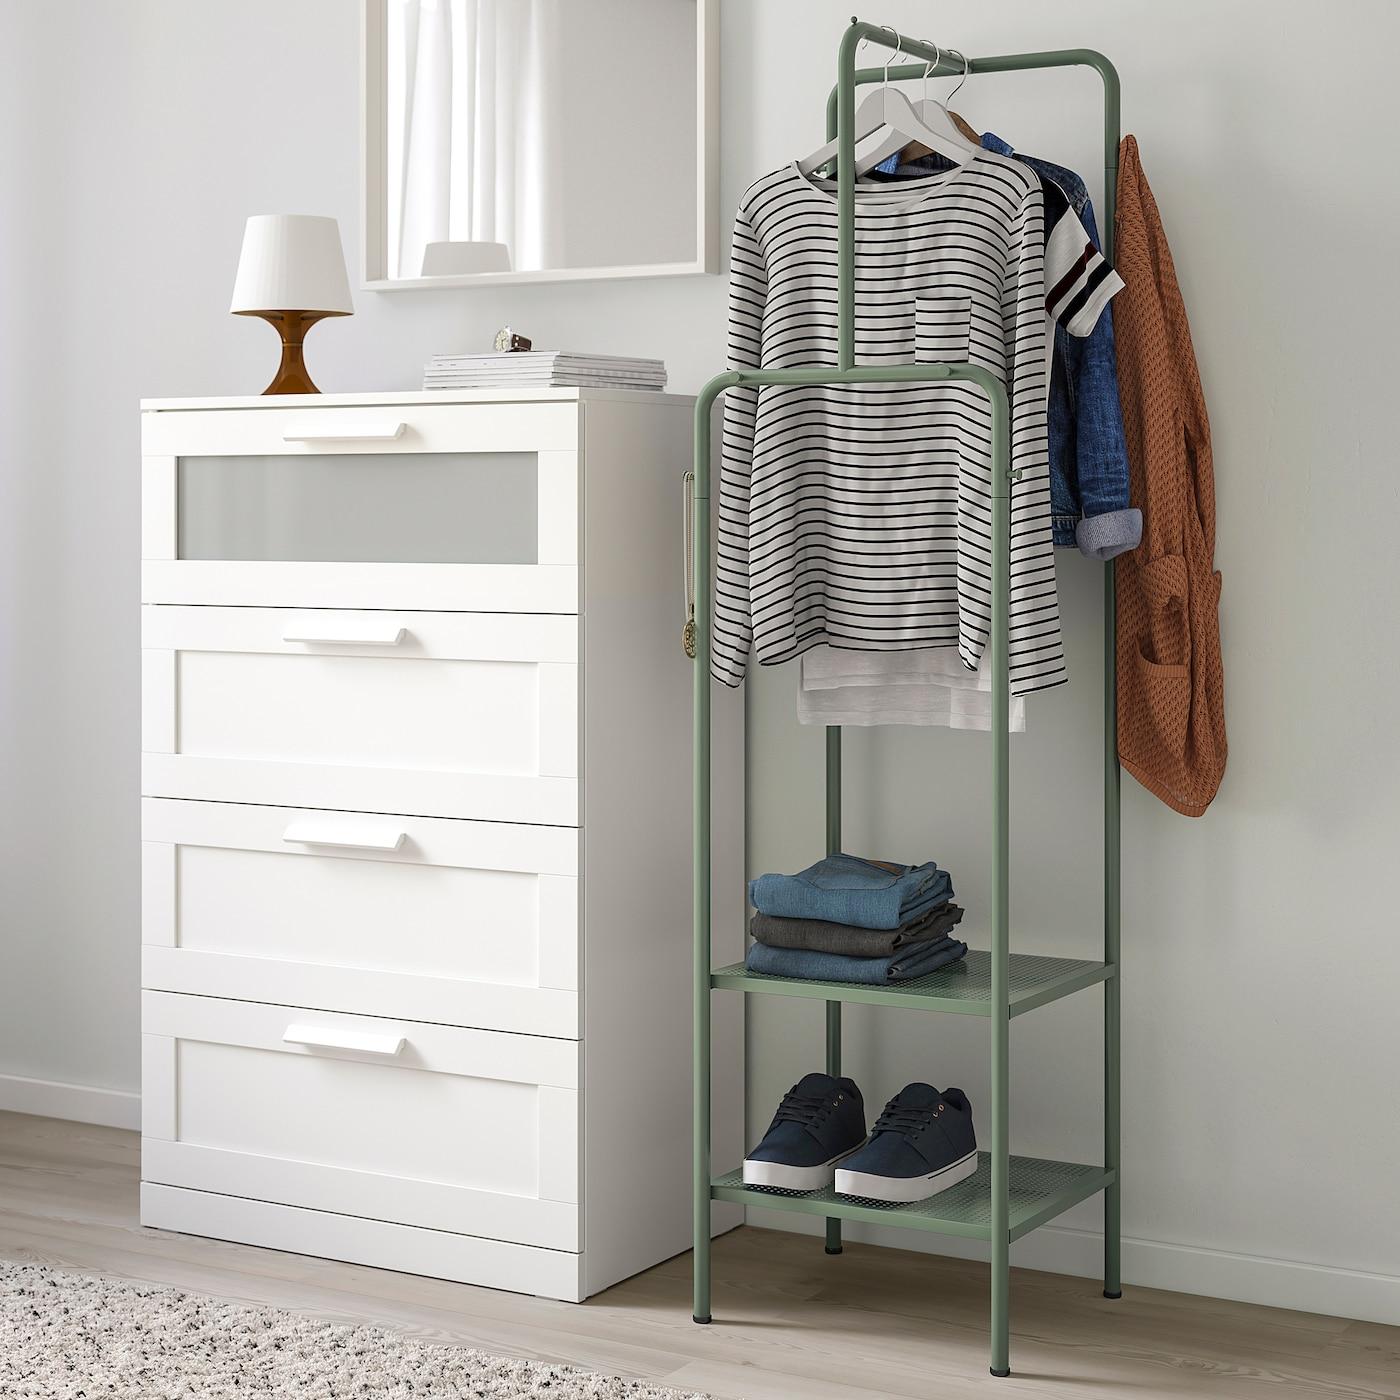 NIKKEBY Clothes rack, grey-green, 45x170 cm